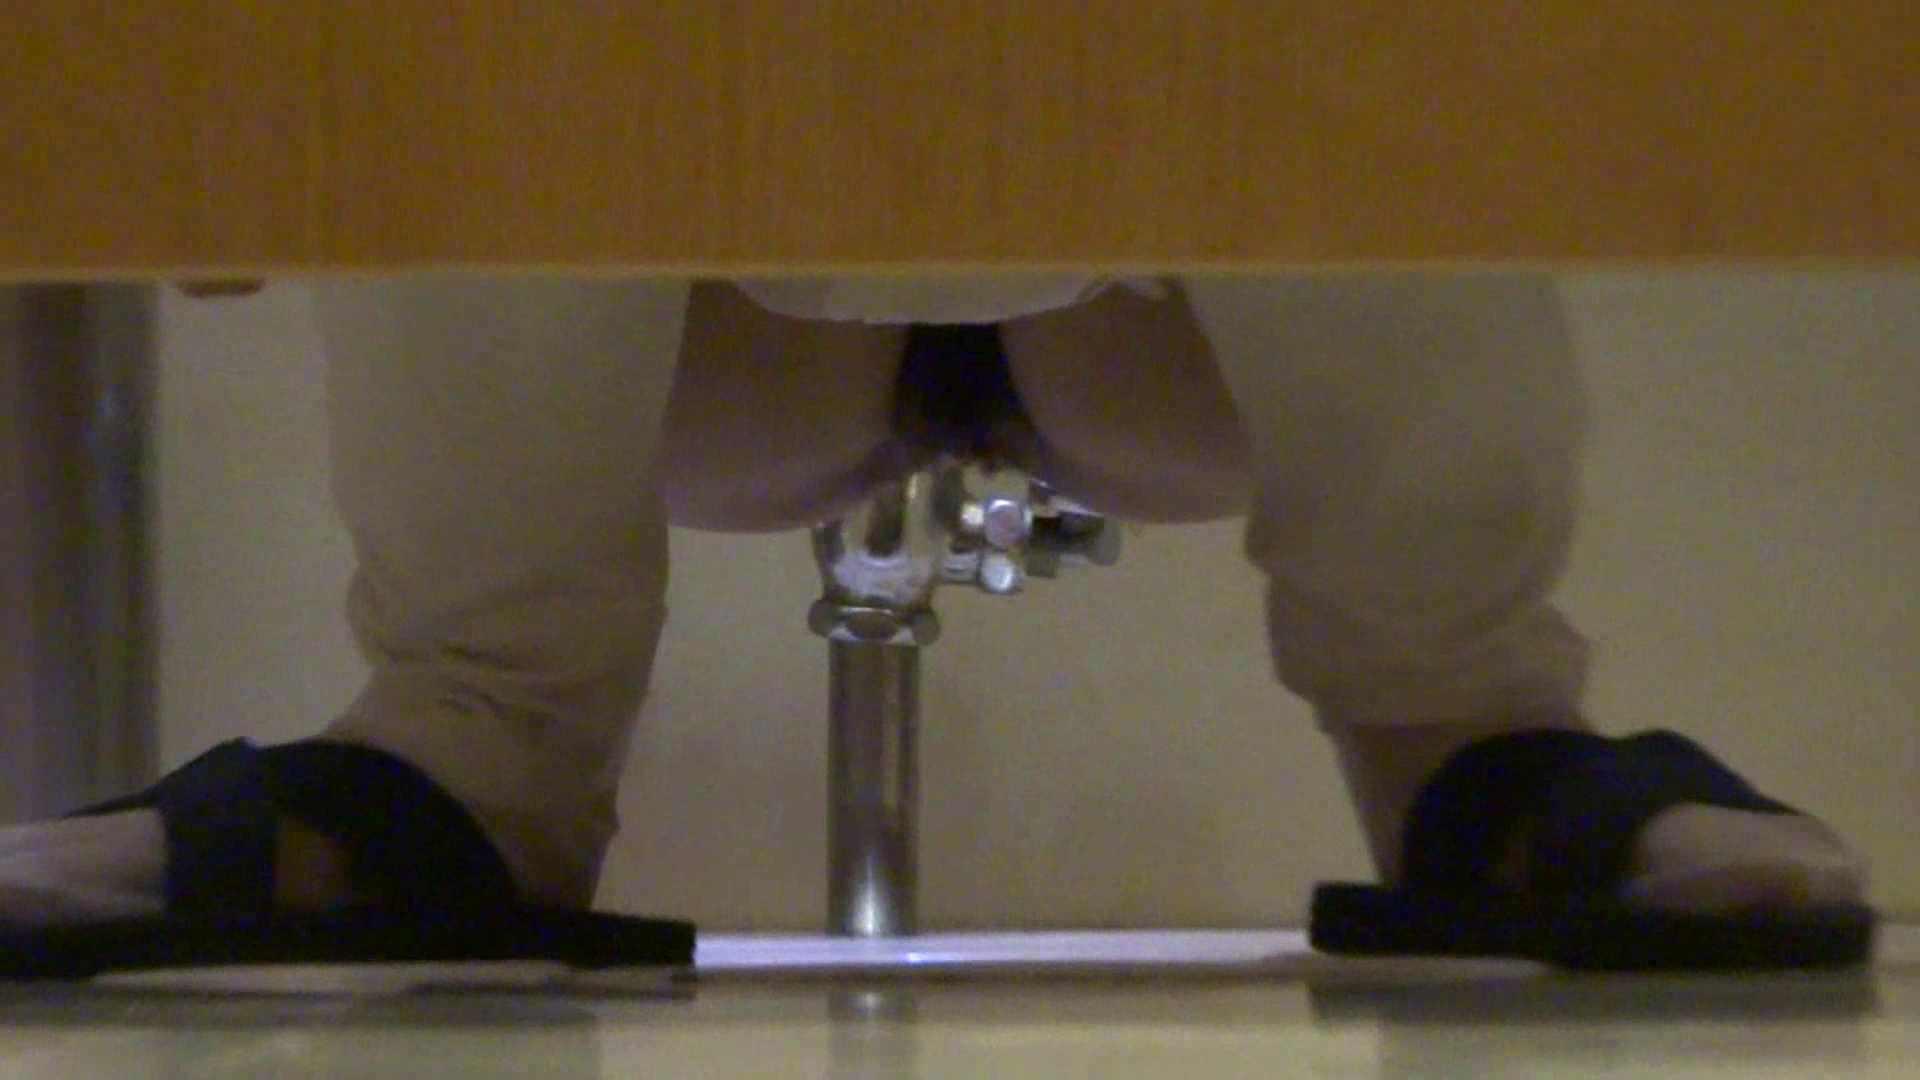 隣国化粧室下から御免!! No.15 洗面所 | 美女H映像  103画像 27